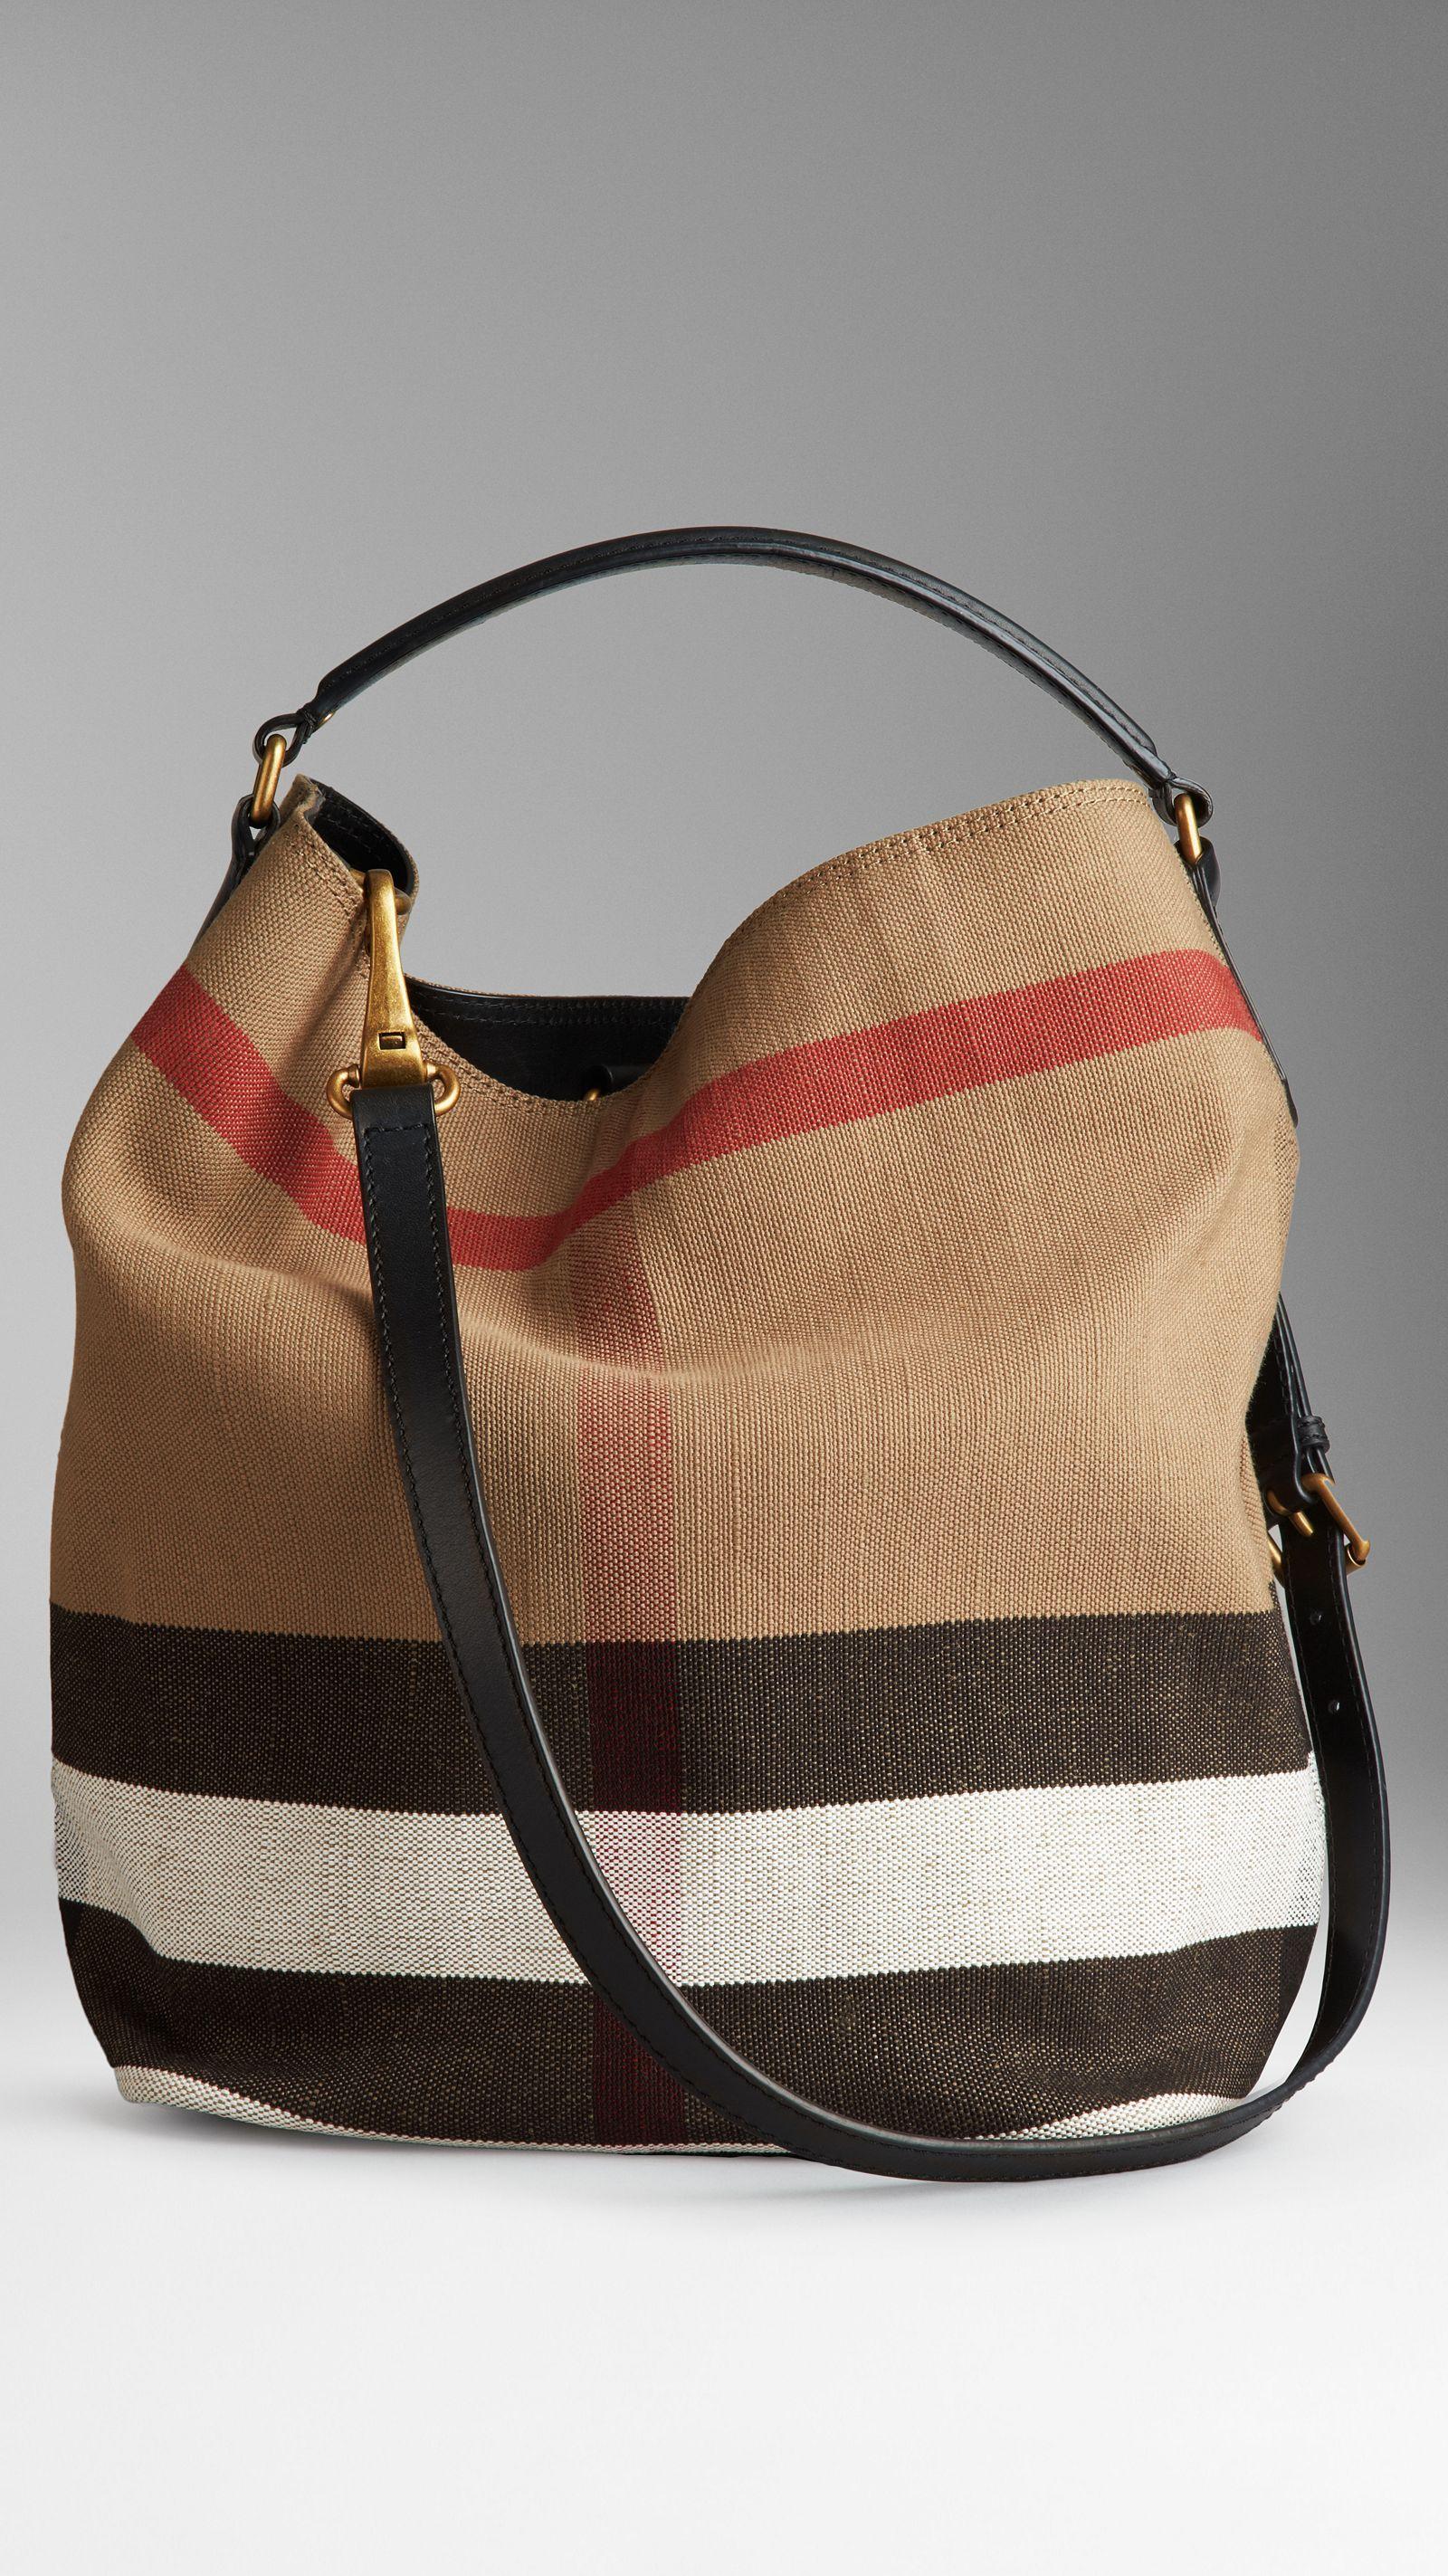 Womens Handbags Purses In 2018 My Style Pinterest Bags Fossil Emerson Satchel Large Floral Tas Wanita Multicolor Medium Canvas Check Hobo Bag Burberry